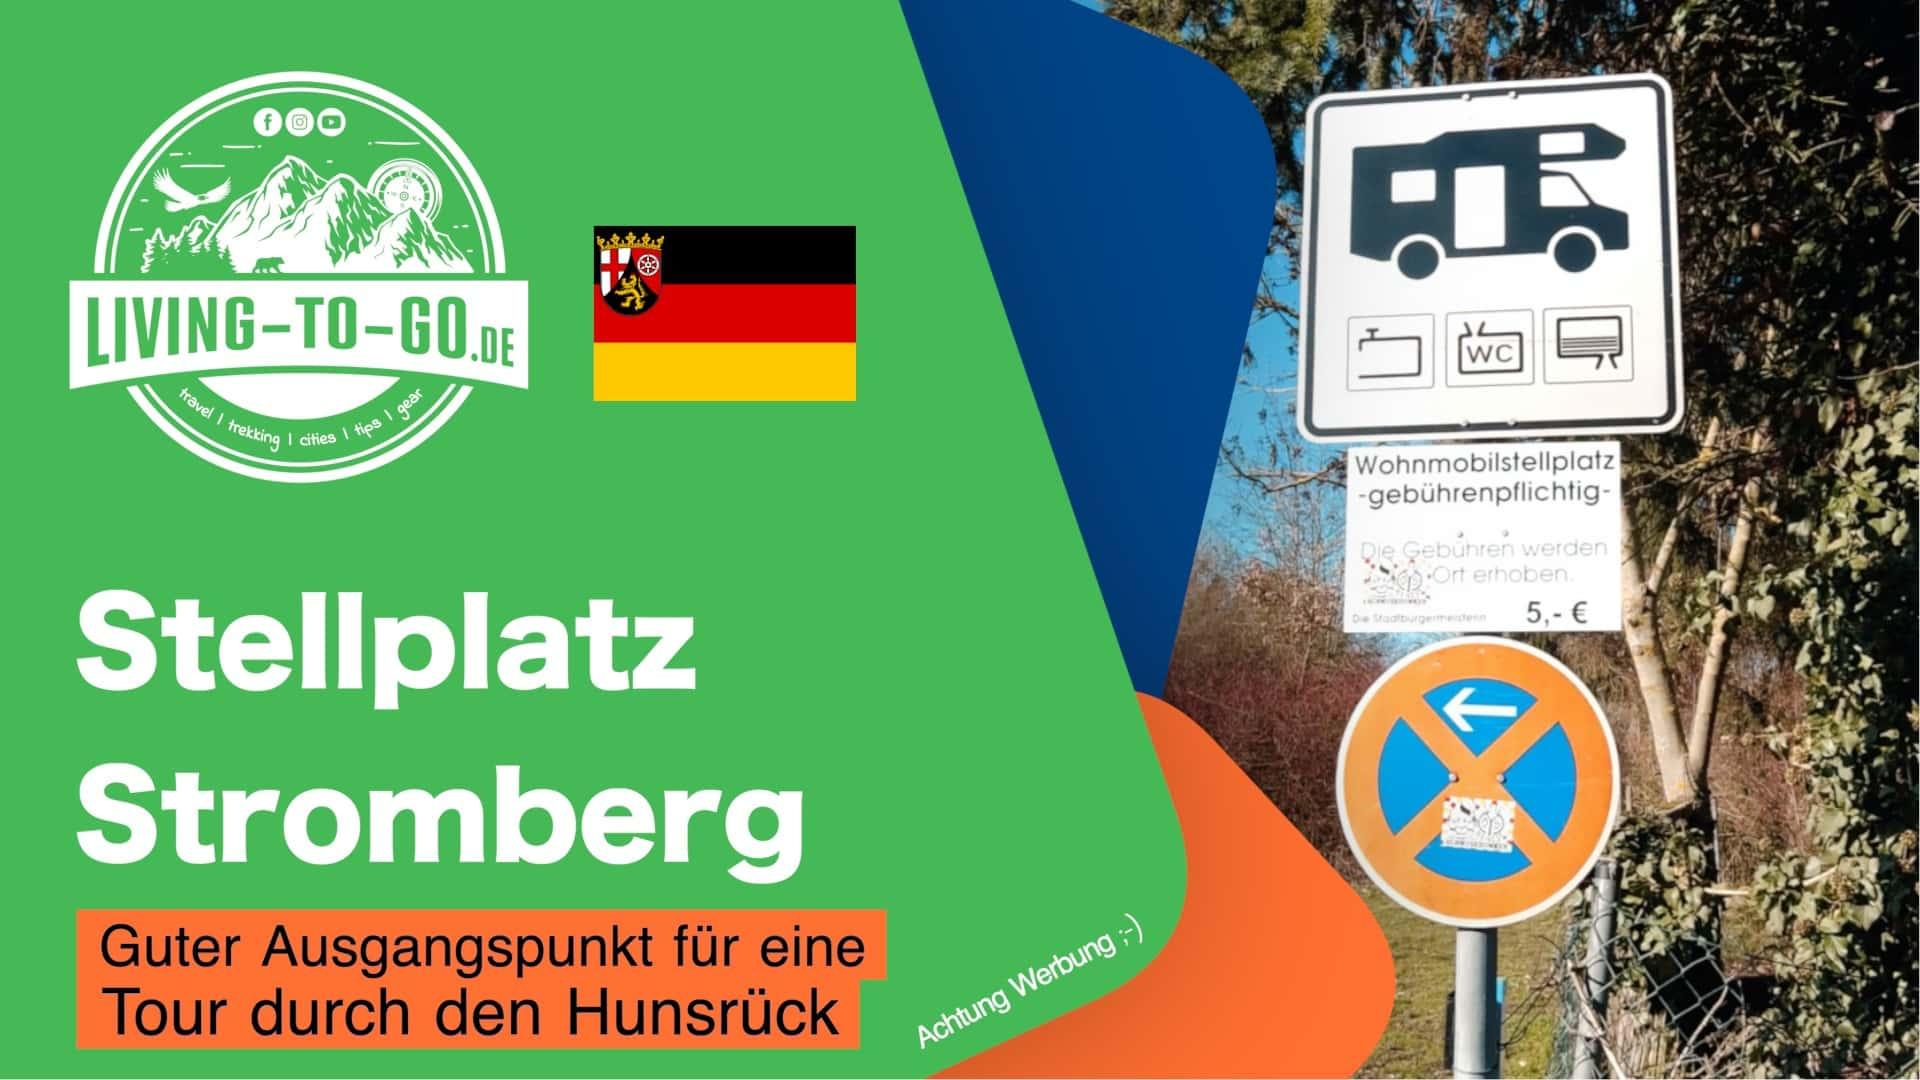 Stellplatz Stromberg